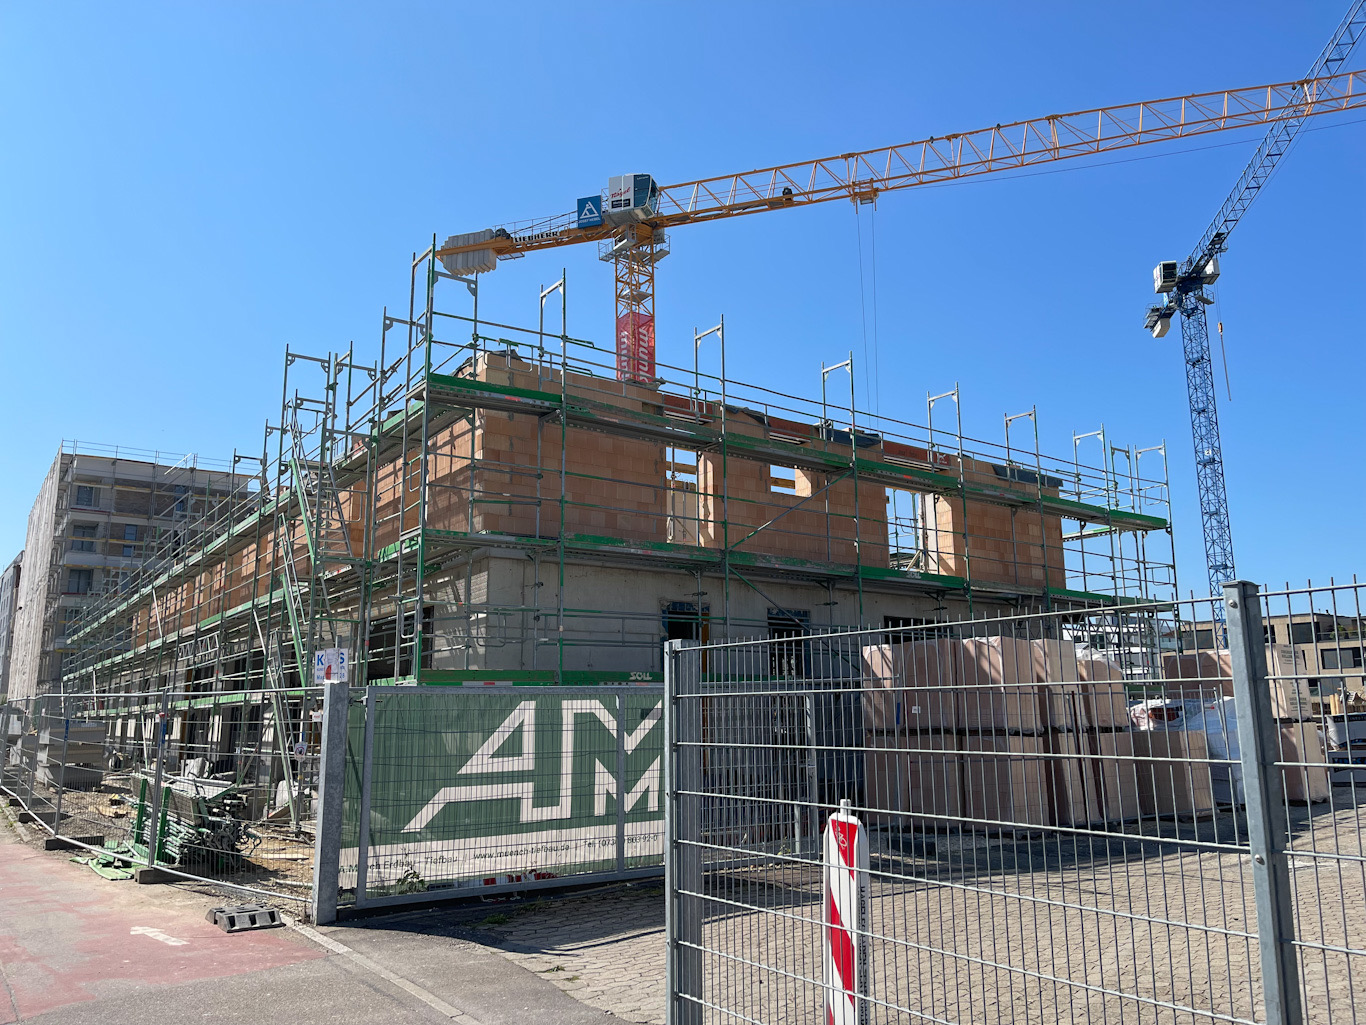 Ulm, Neubau, Quartier Söflingen, September 2021